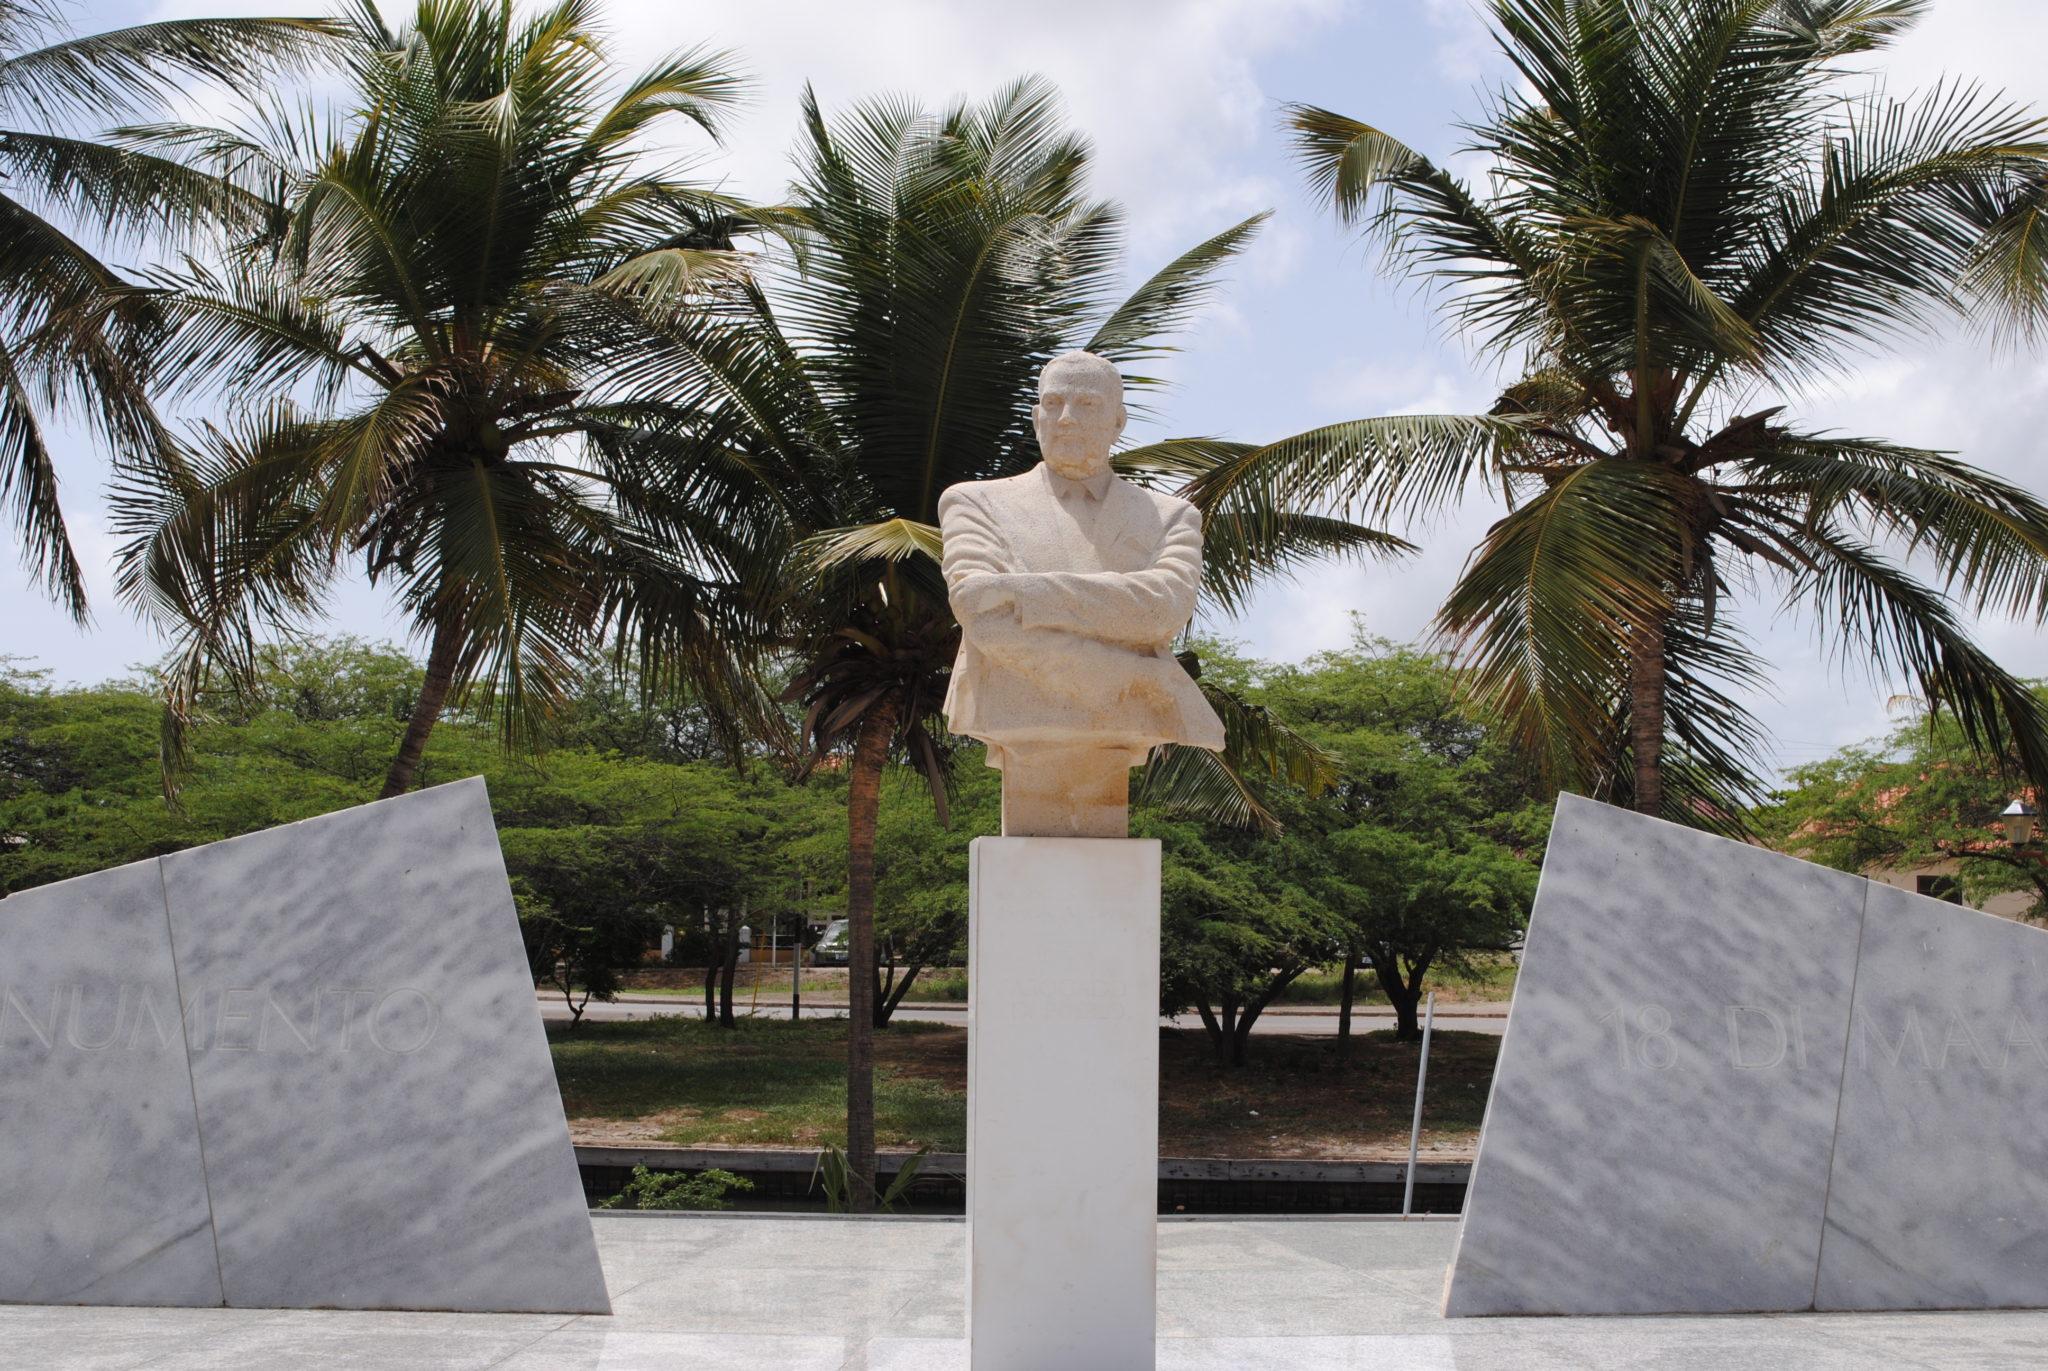 Eman, Cornelis Albert (Shon A) | Aruba Vakantieland